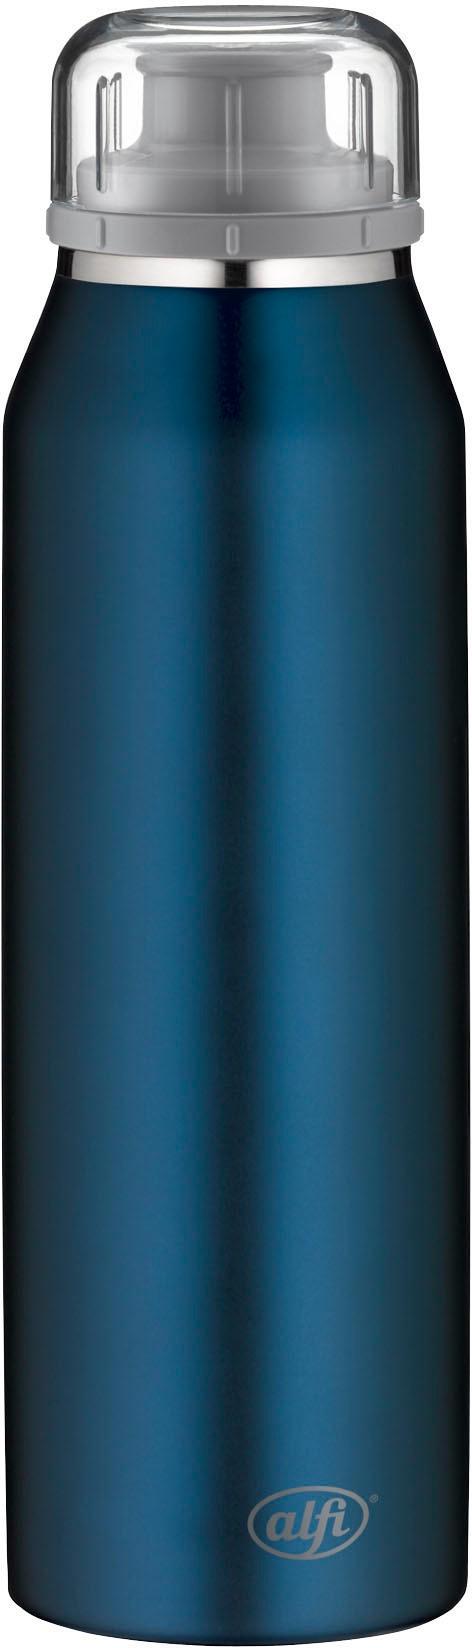 Alfi Thermoflasche Pure, 500 ml blau Campinggeschirr Camping Schlafen Outdoor